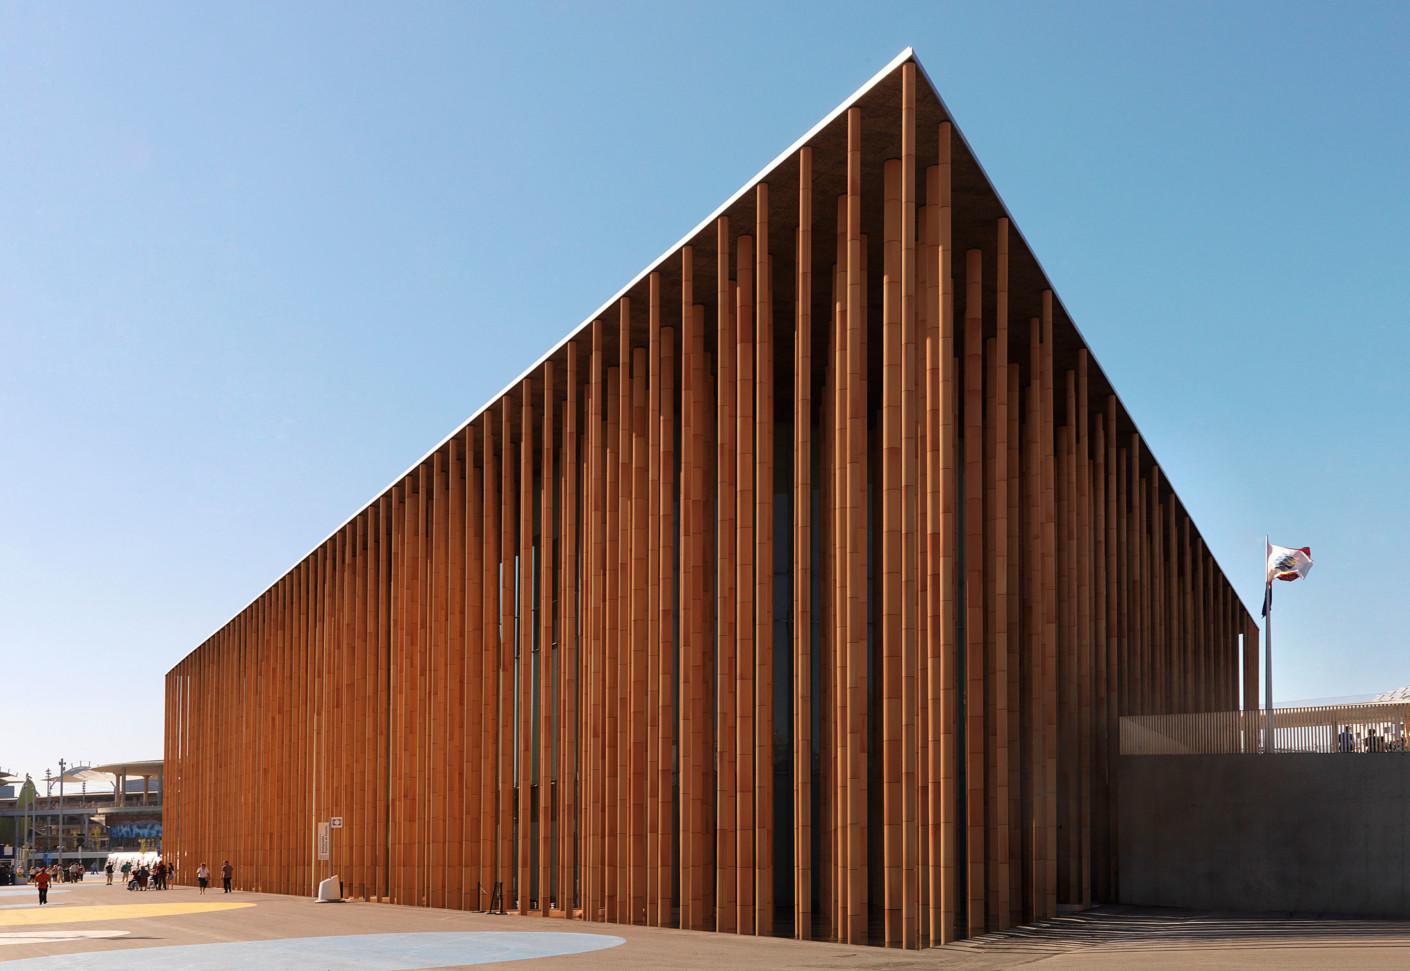 Facade Covering Spanish Expo Pavilion Zaragoza Spain By